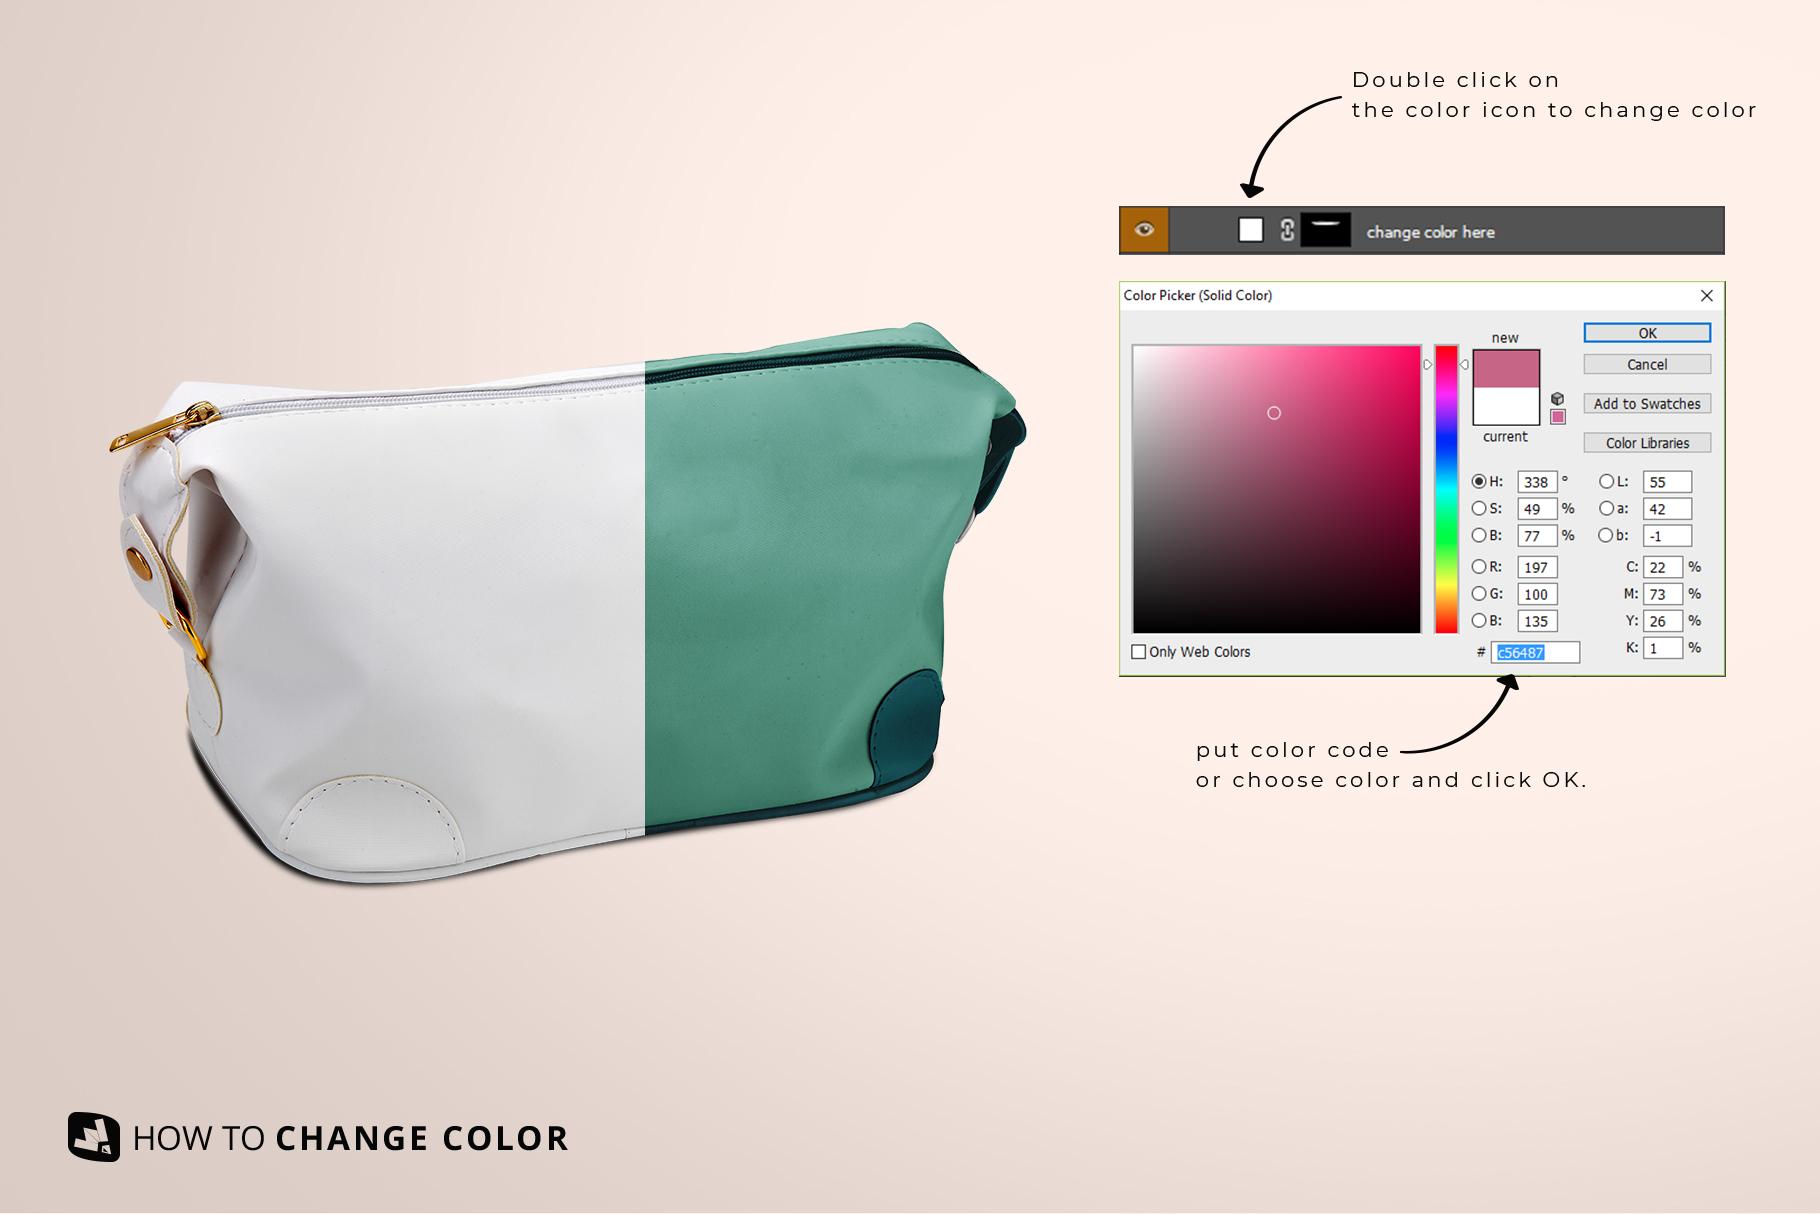 change color of the leather makeup bag mockup